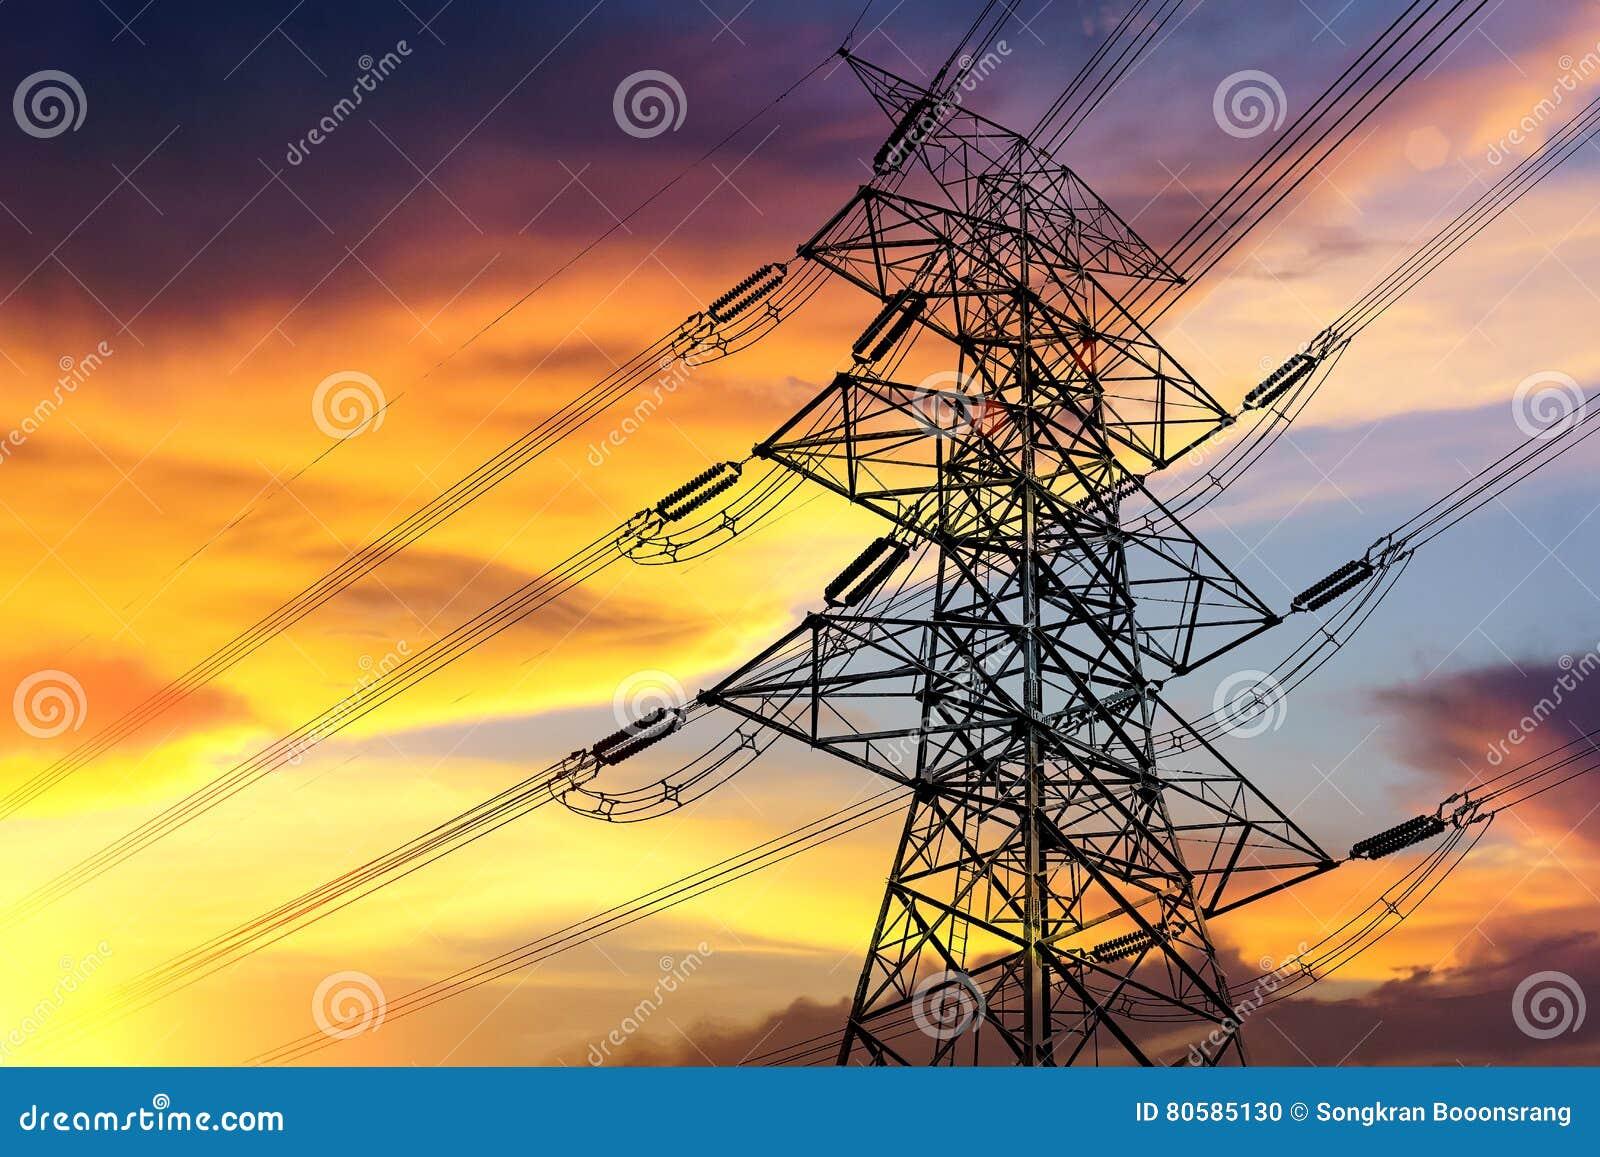 High voltage transmission tower.